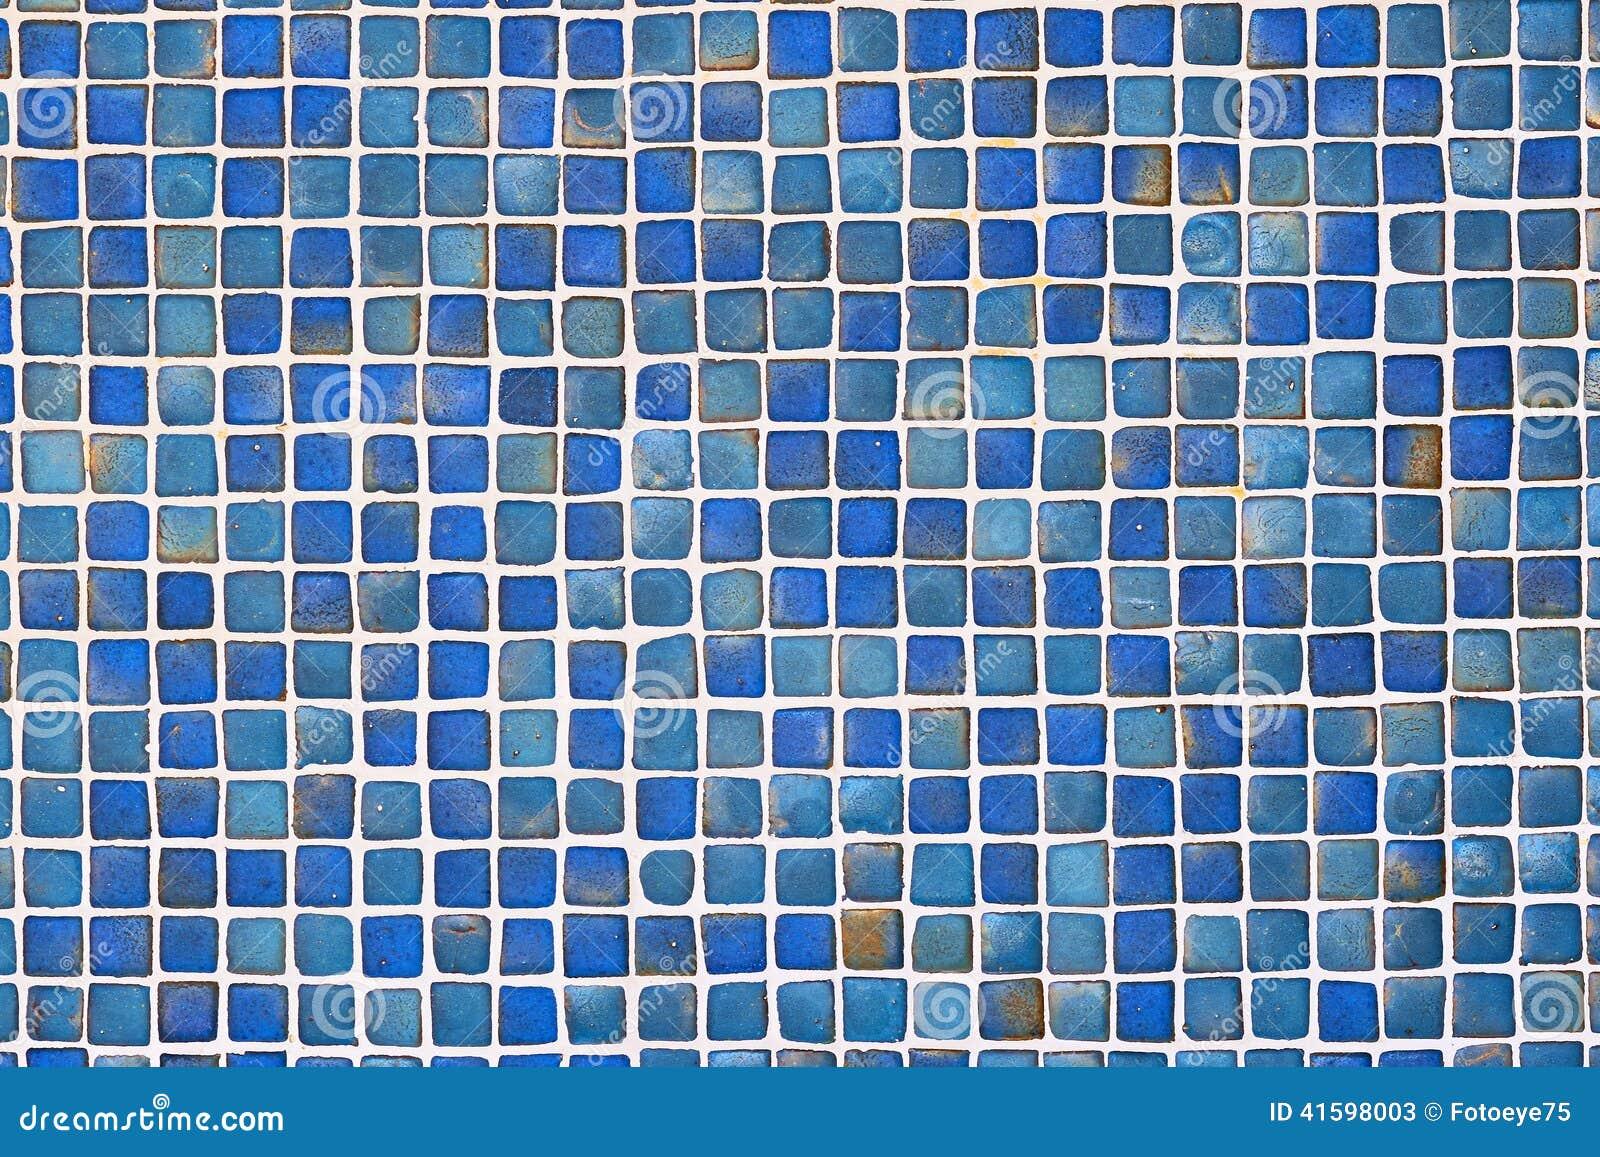 Fond bleu en c ramique de mur de tuile photo stock image for Carreau bleu mur salle de bain marseille